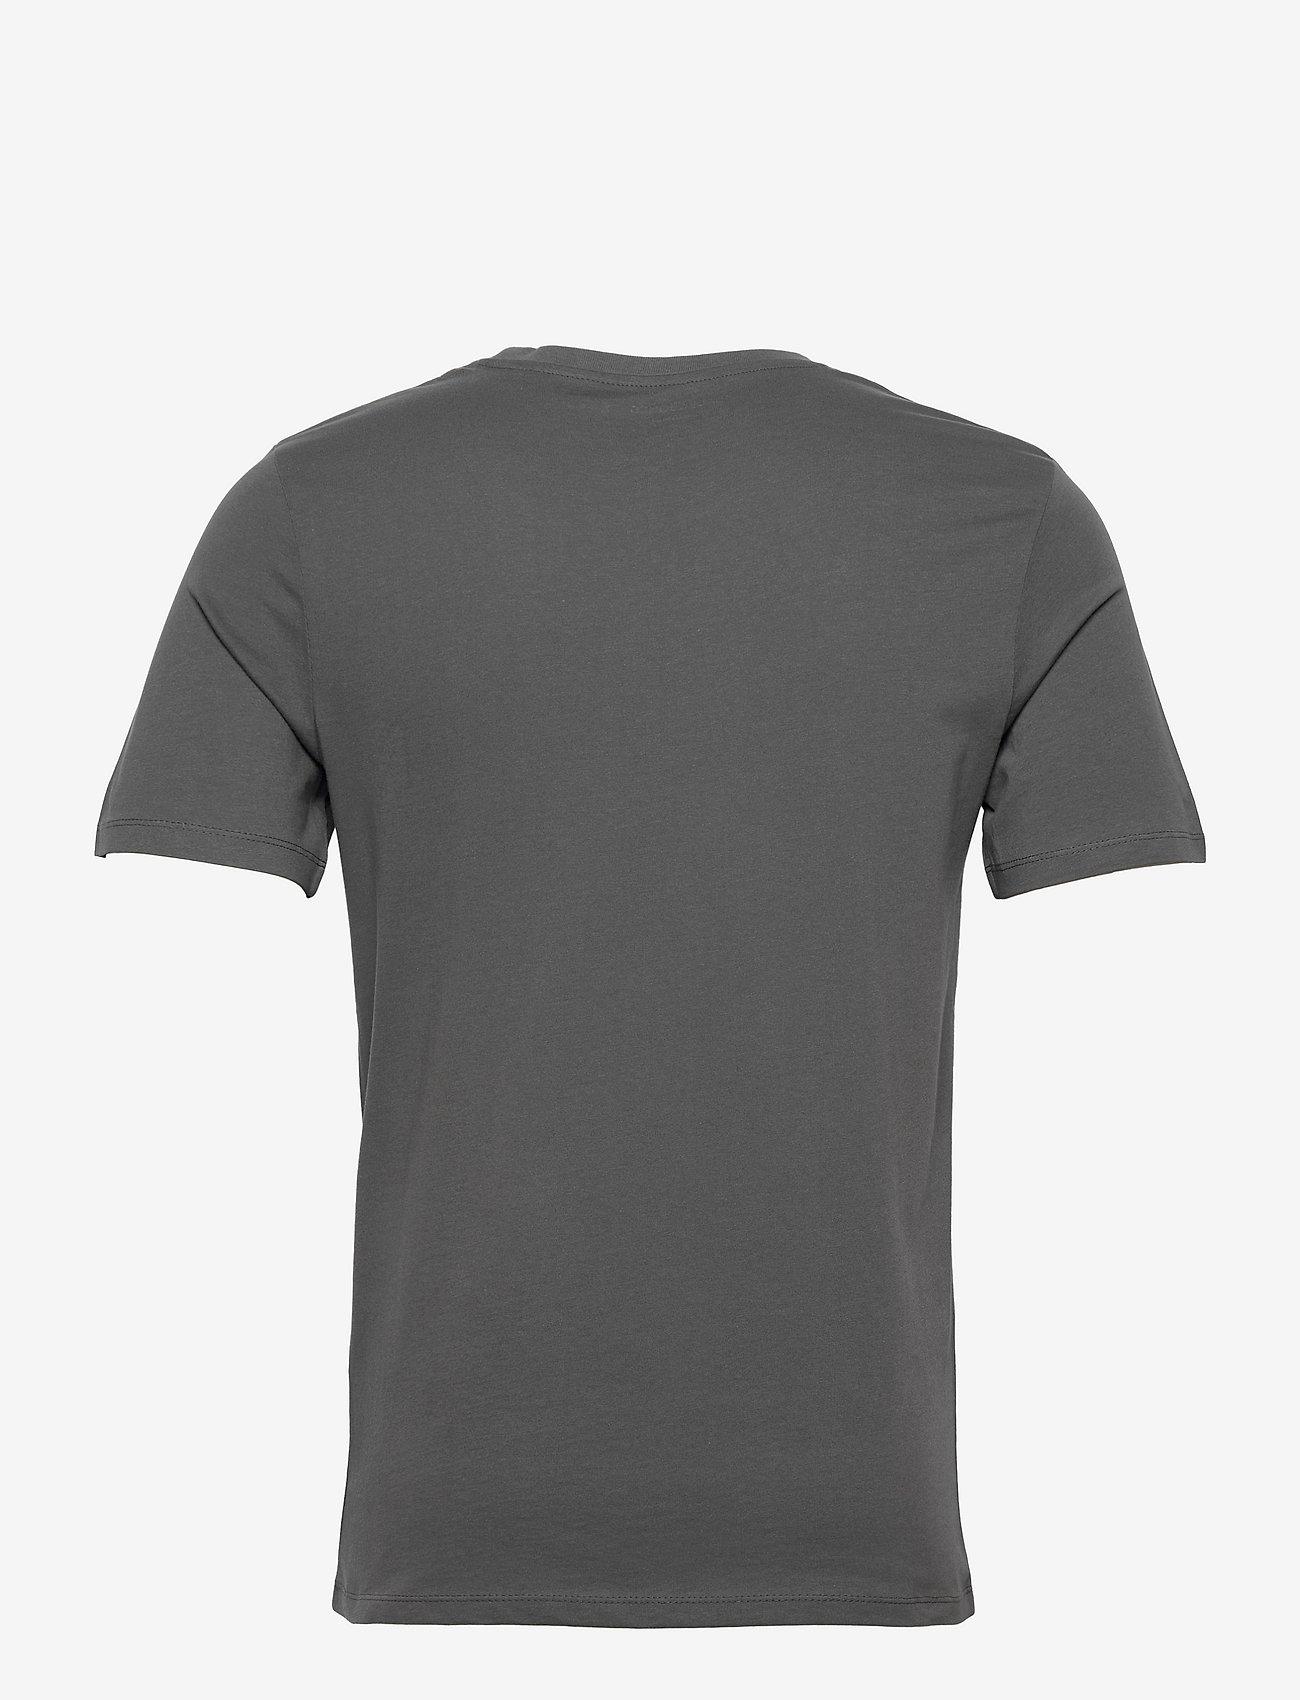 Jack & Jones - JJELOGO TEE SS O-NECK 2 COL AW21 SN - kortärmade t-shirts - asphalt - 1